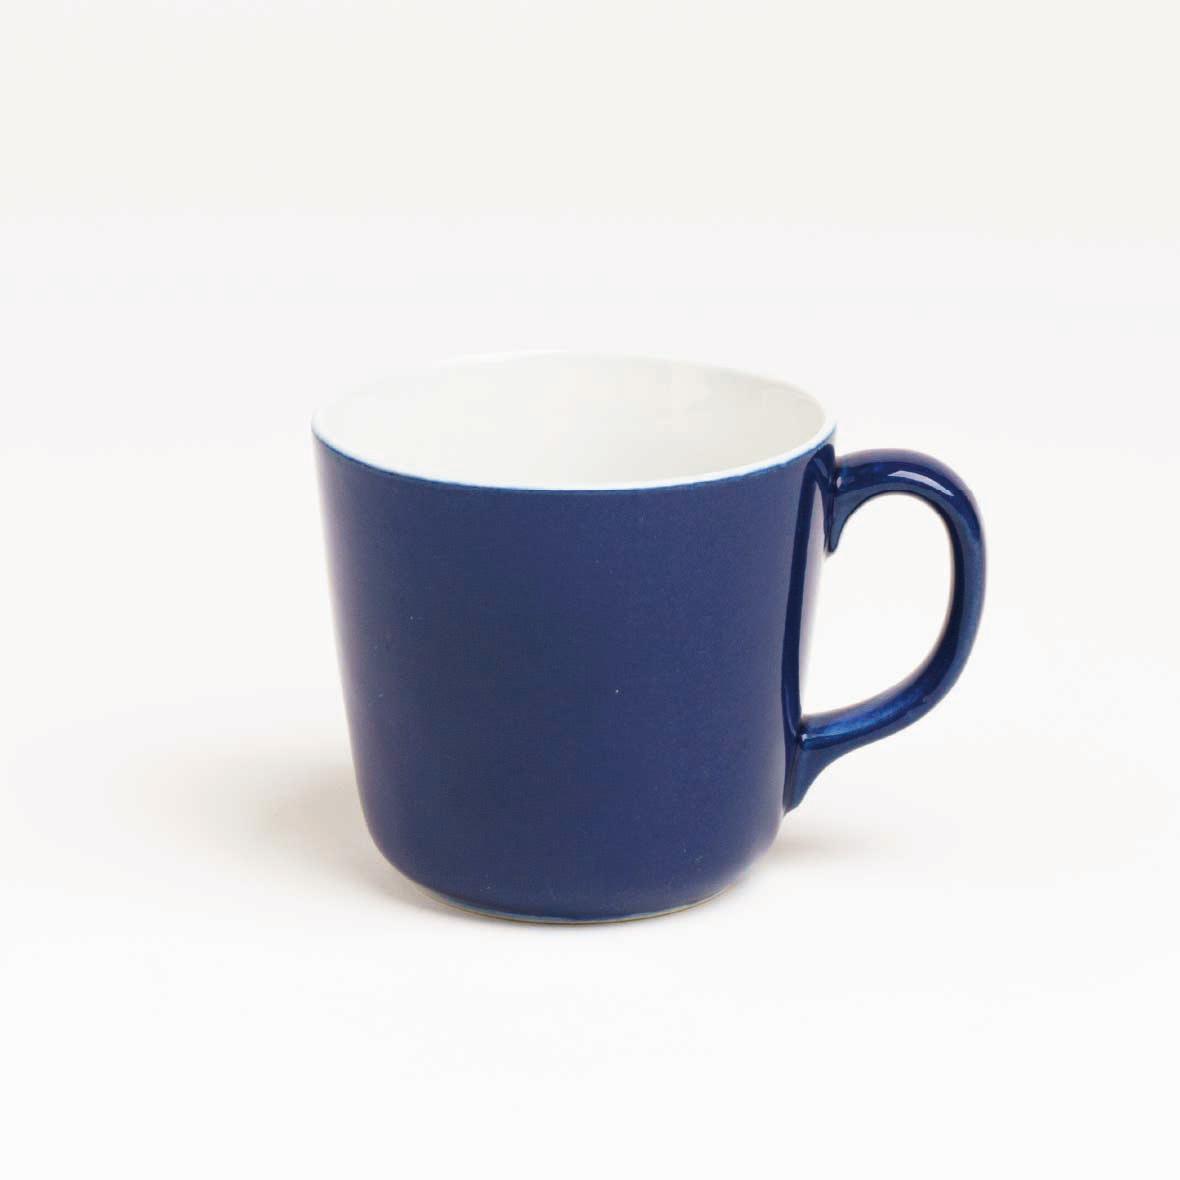 【TK】ARABIA Kilta マグカップ